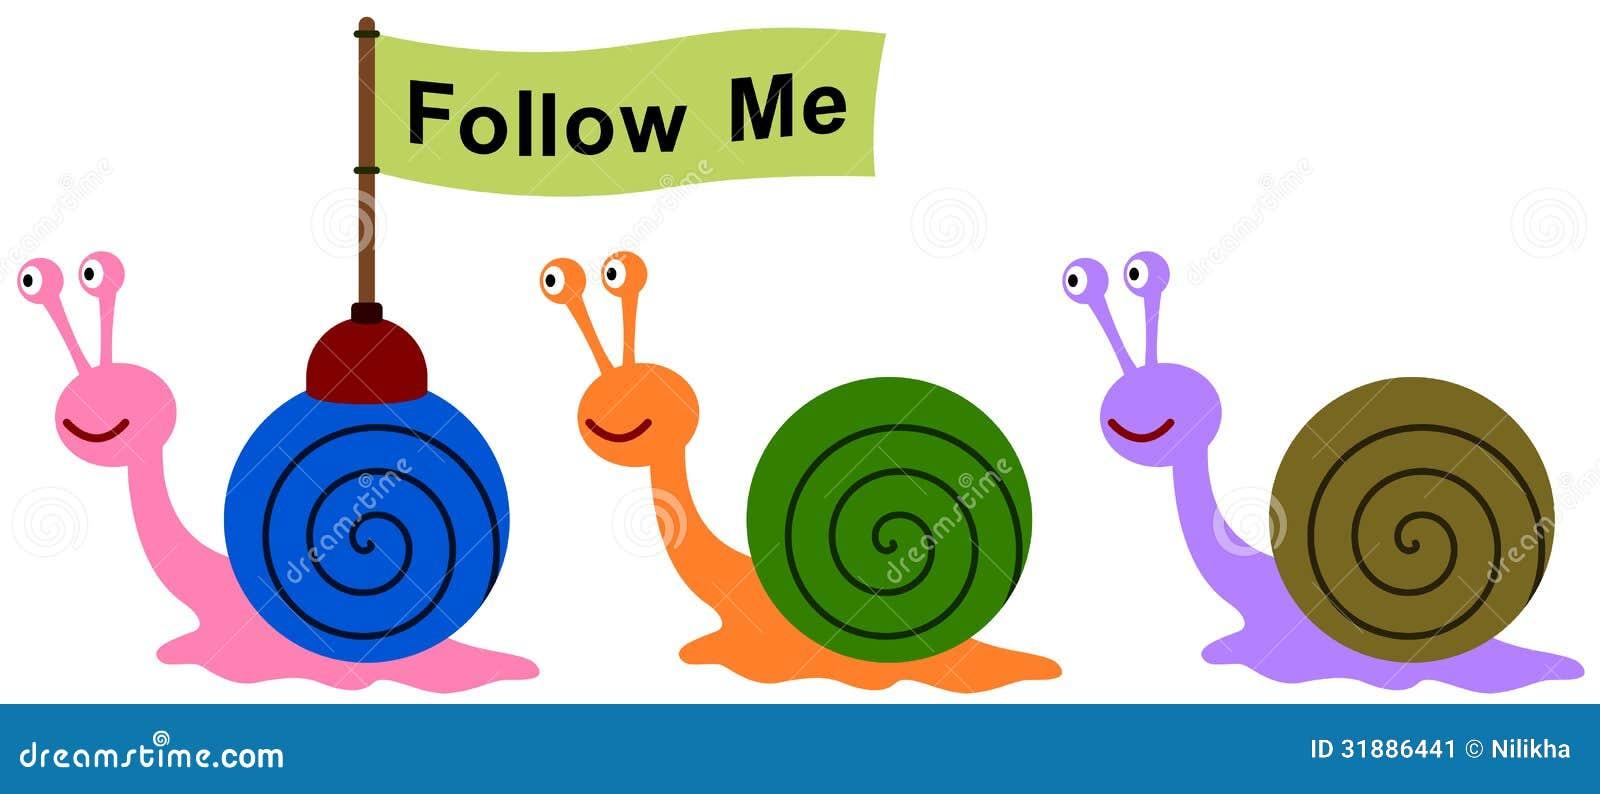 Snail Leader Stock Image - Image: 31886441